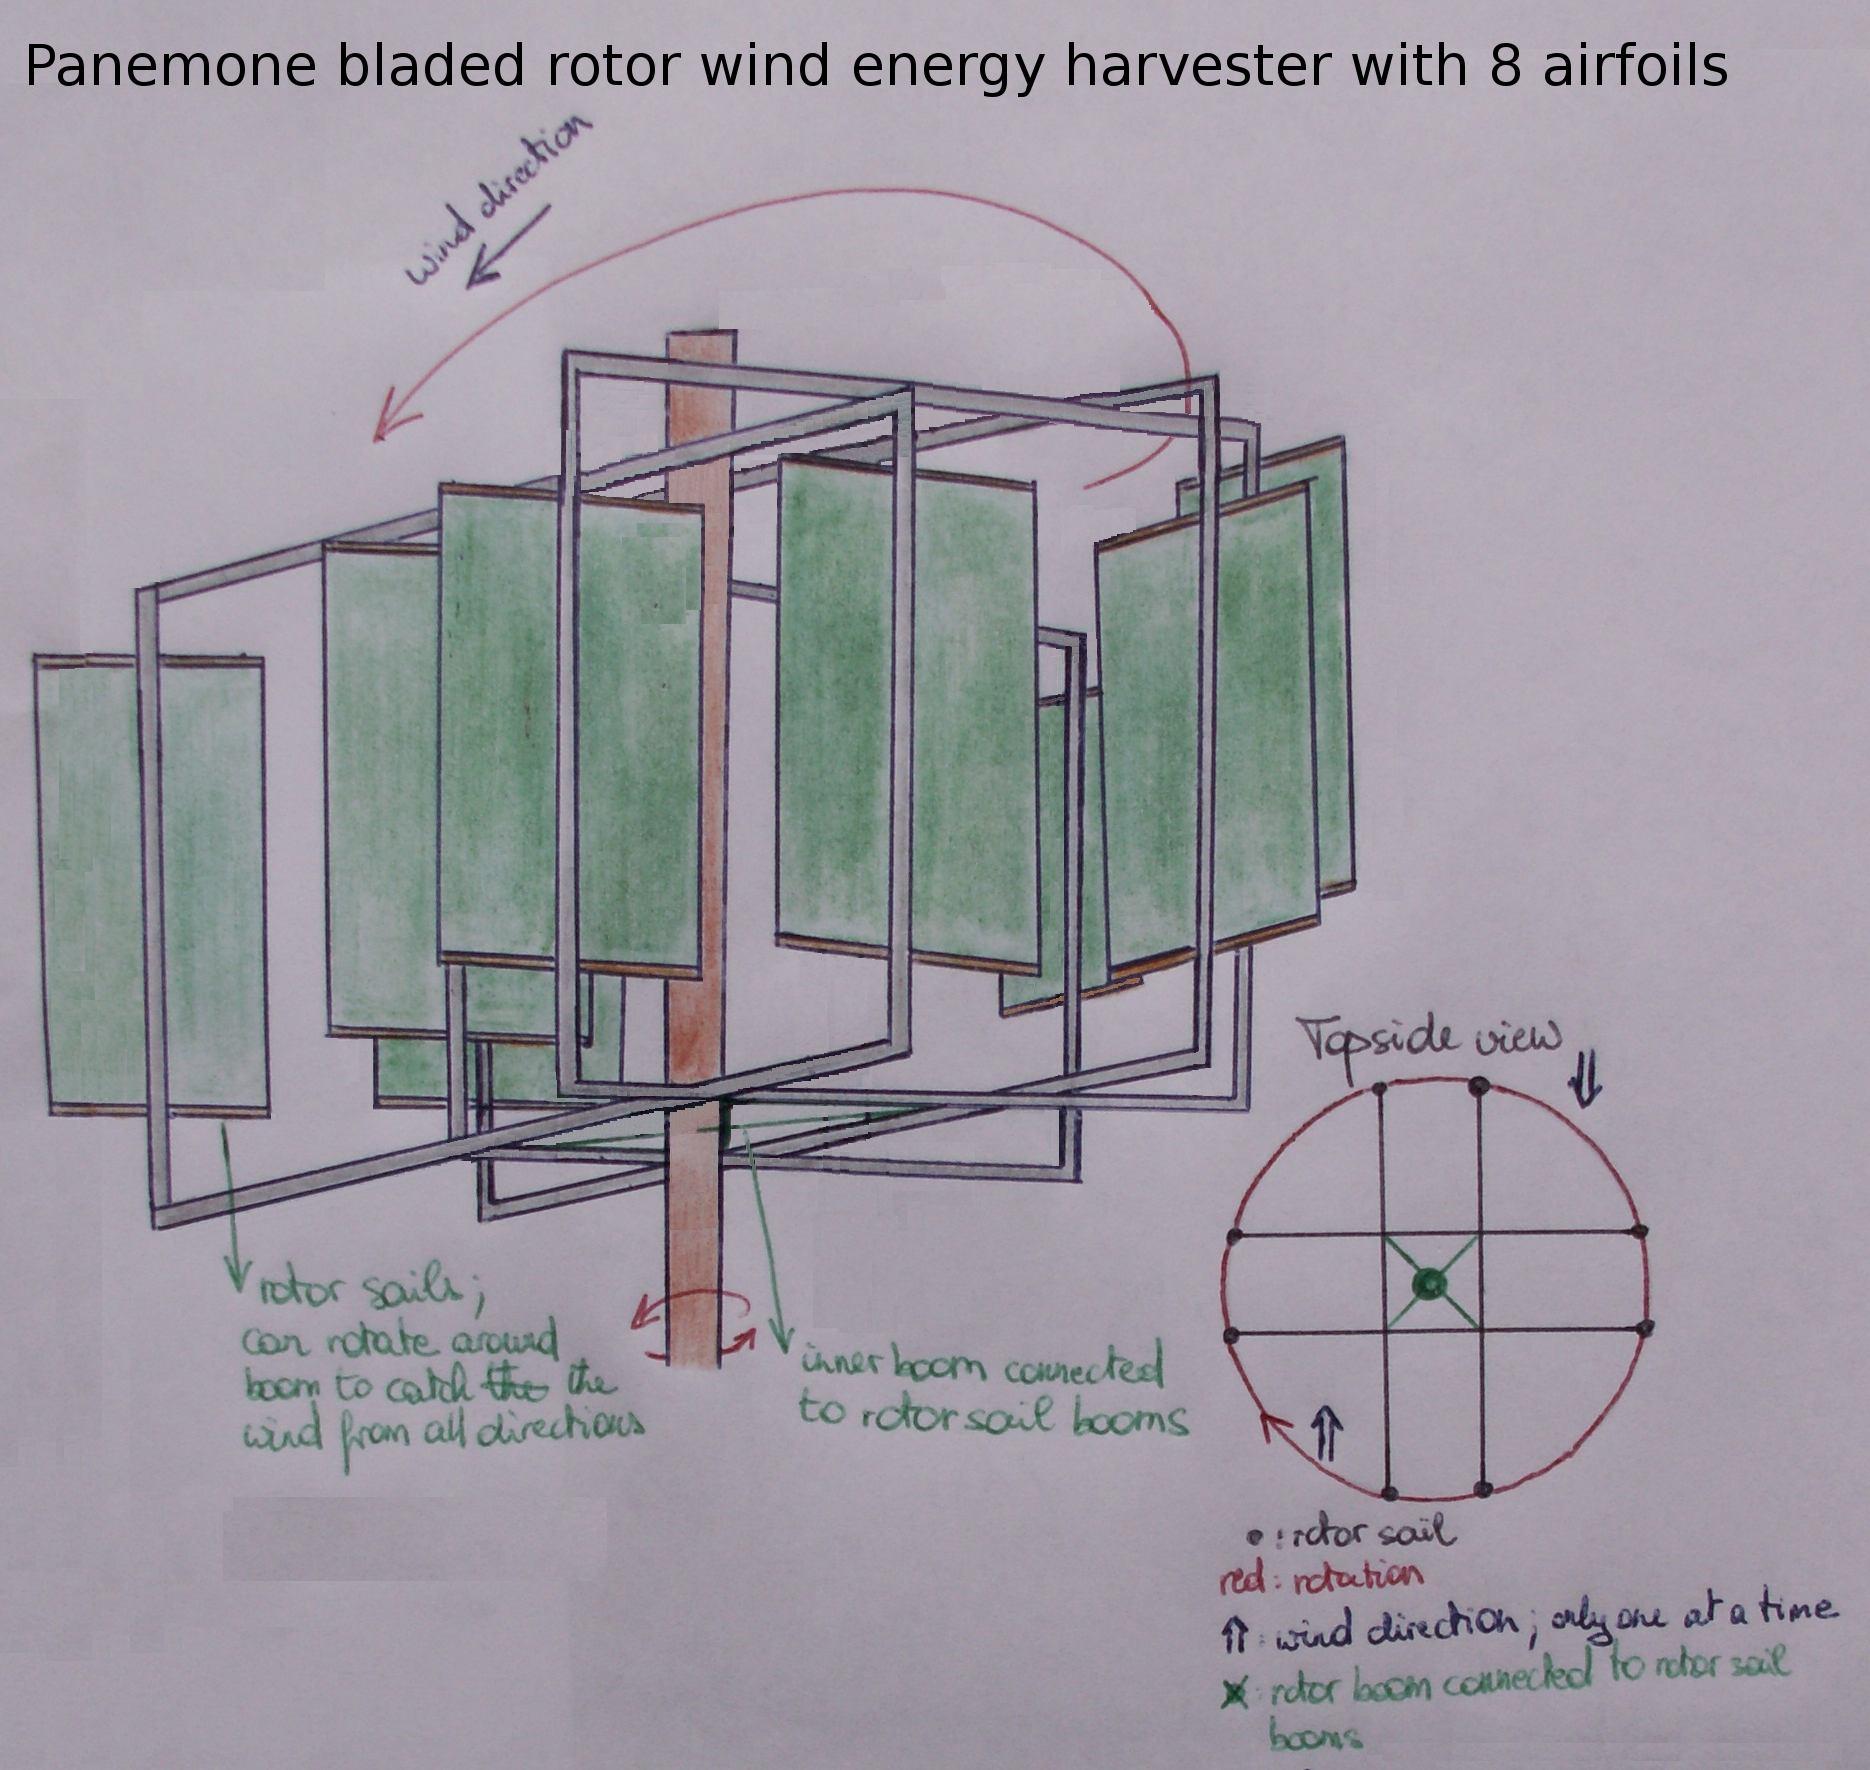 File:Panemone bladed rotor wind energy harvester.JPG - Wikimedia ...